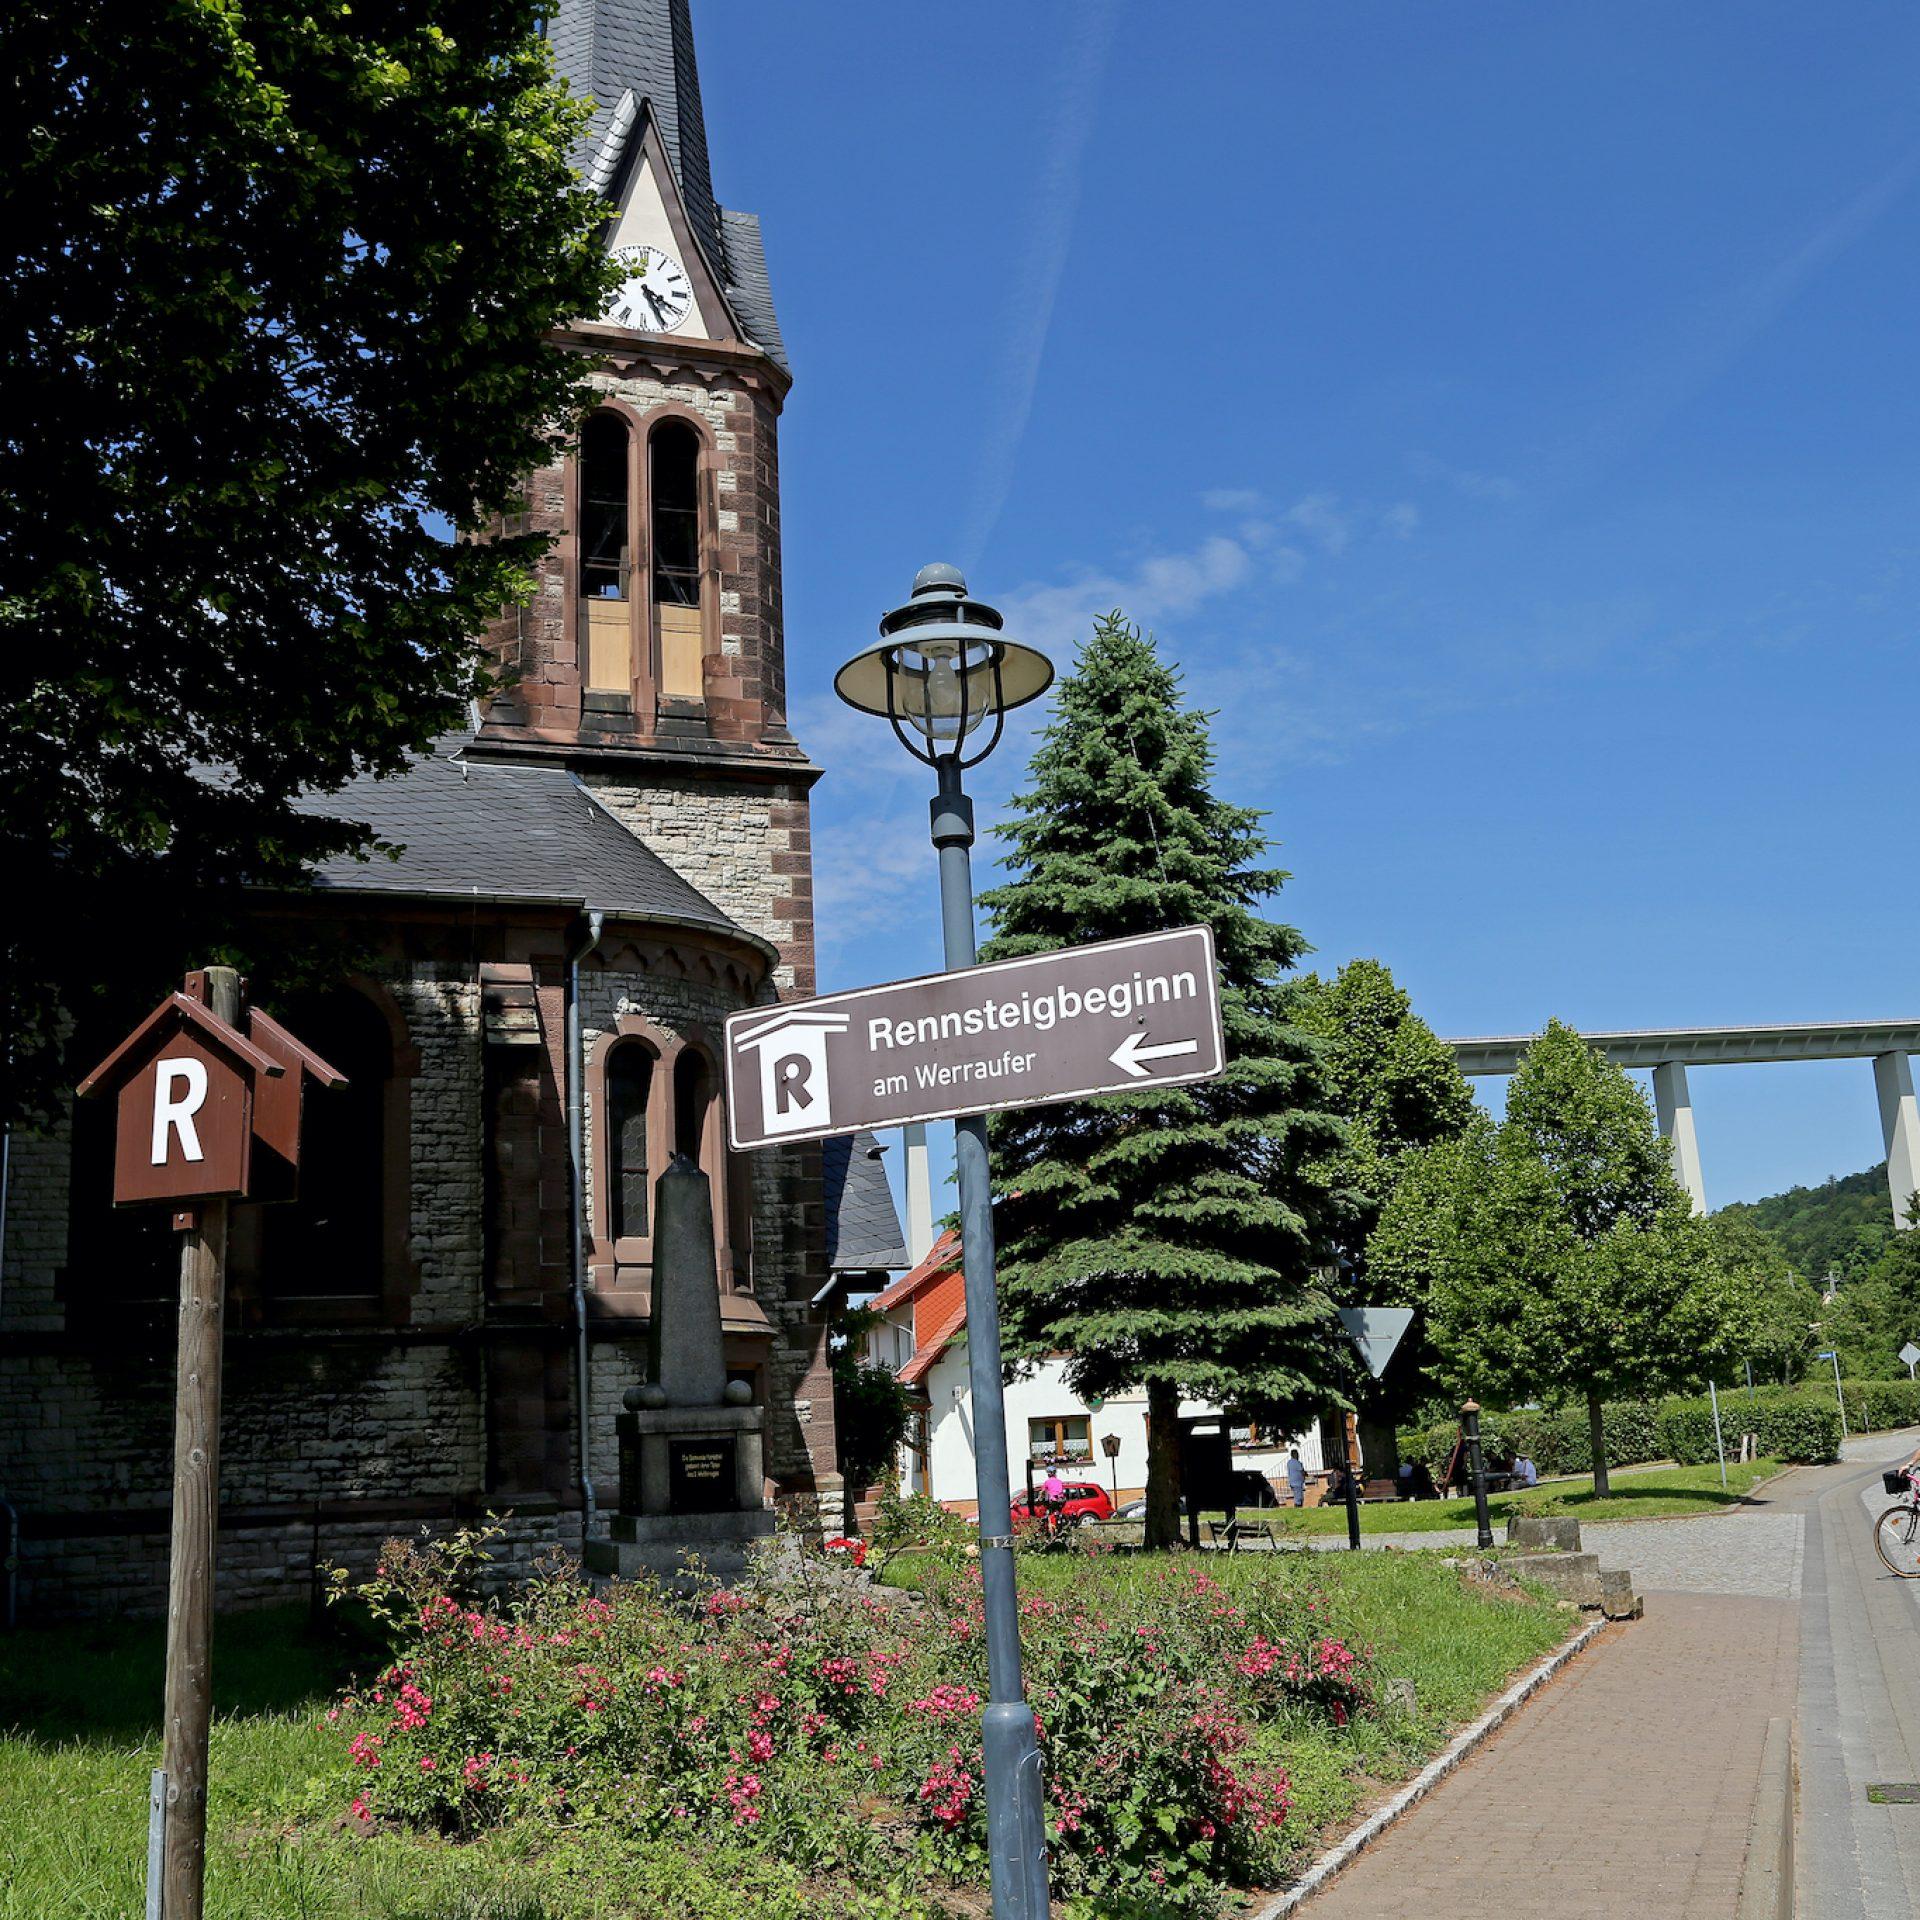 Werratalradweg, Rennsteigbeginn in Hörschel © Joachim Negwer/ Thüringer Tourismus GmbH